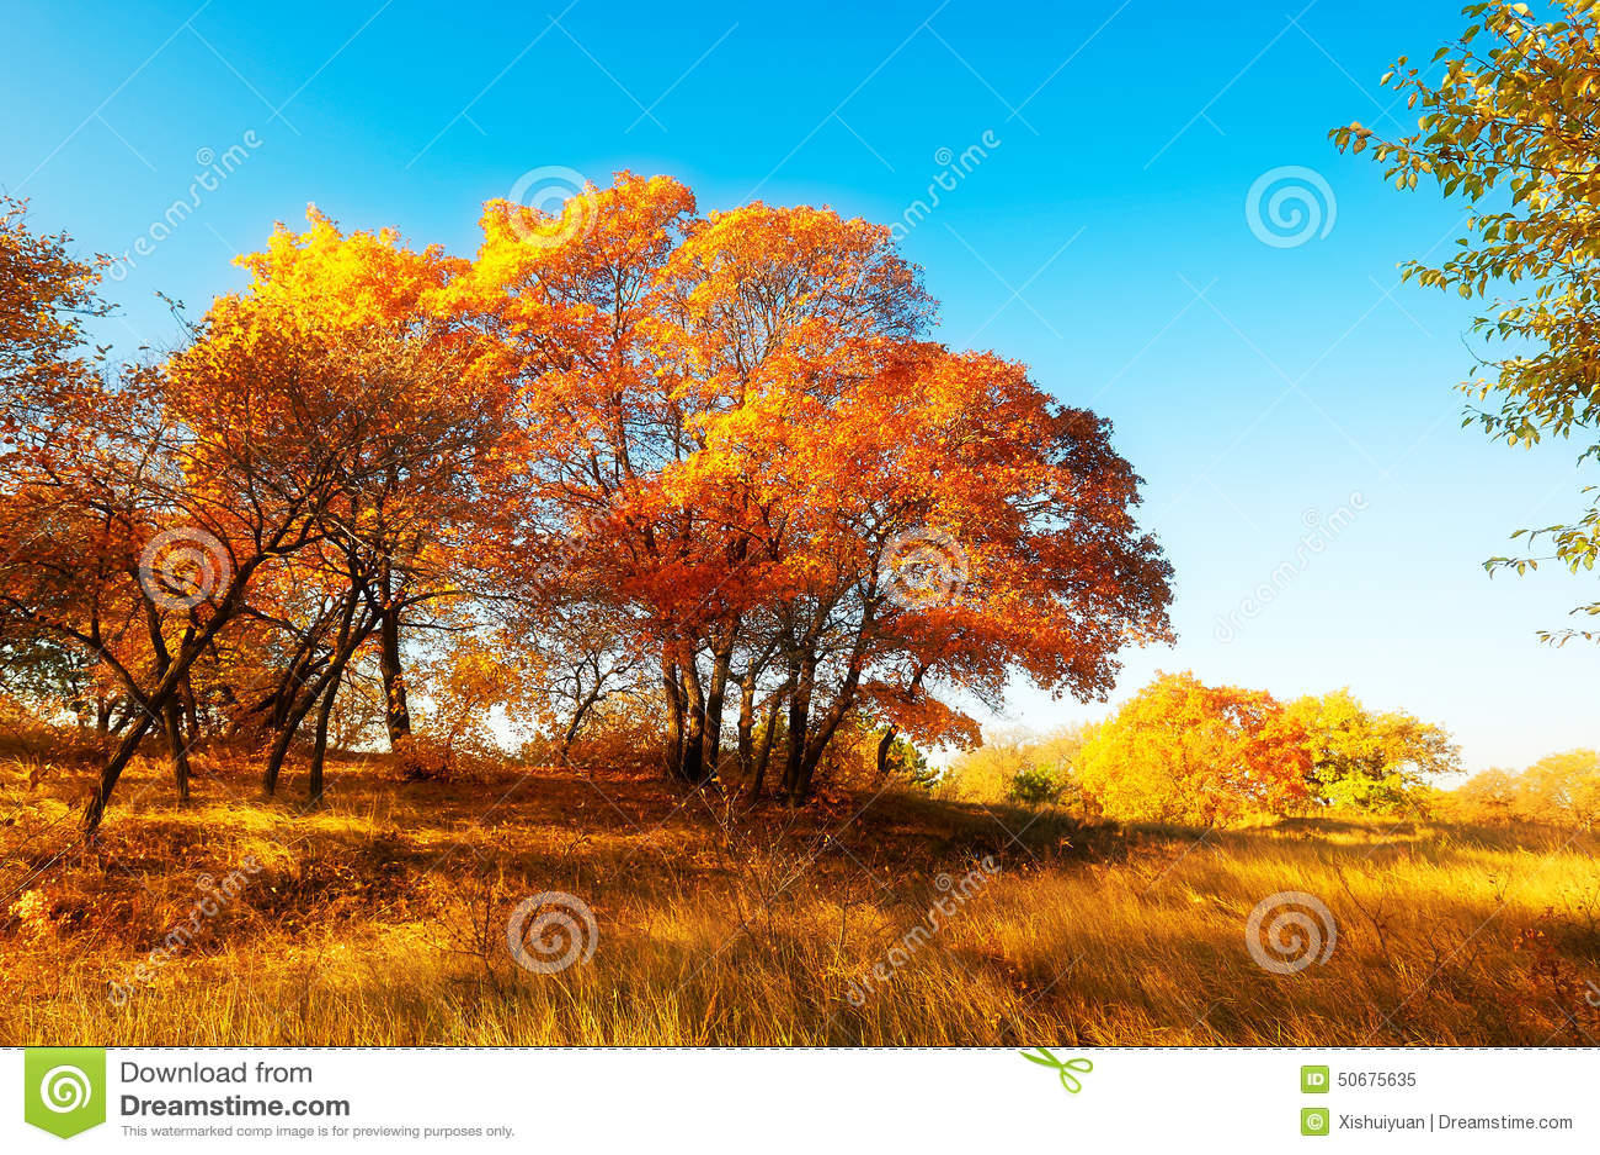 Download 秋天金黄槭树 库存图片. 图片 包括有 槭树, 蓝绿色, 的treadled, 横向, 照片, 阳光, 汉语 - 50675635